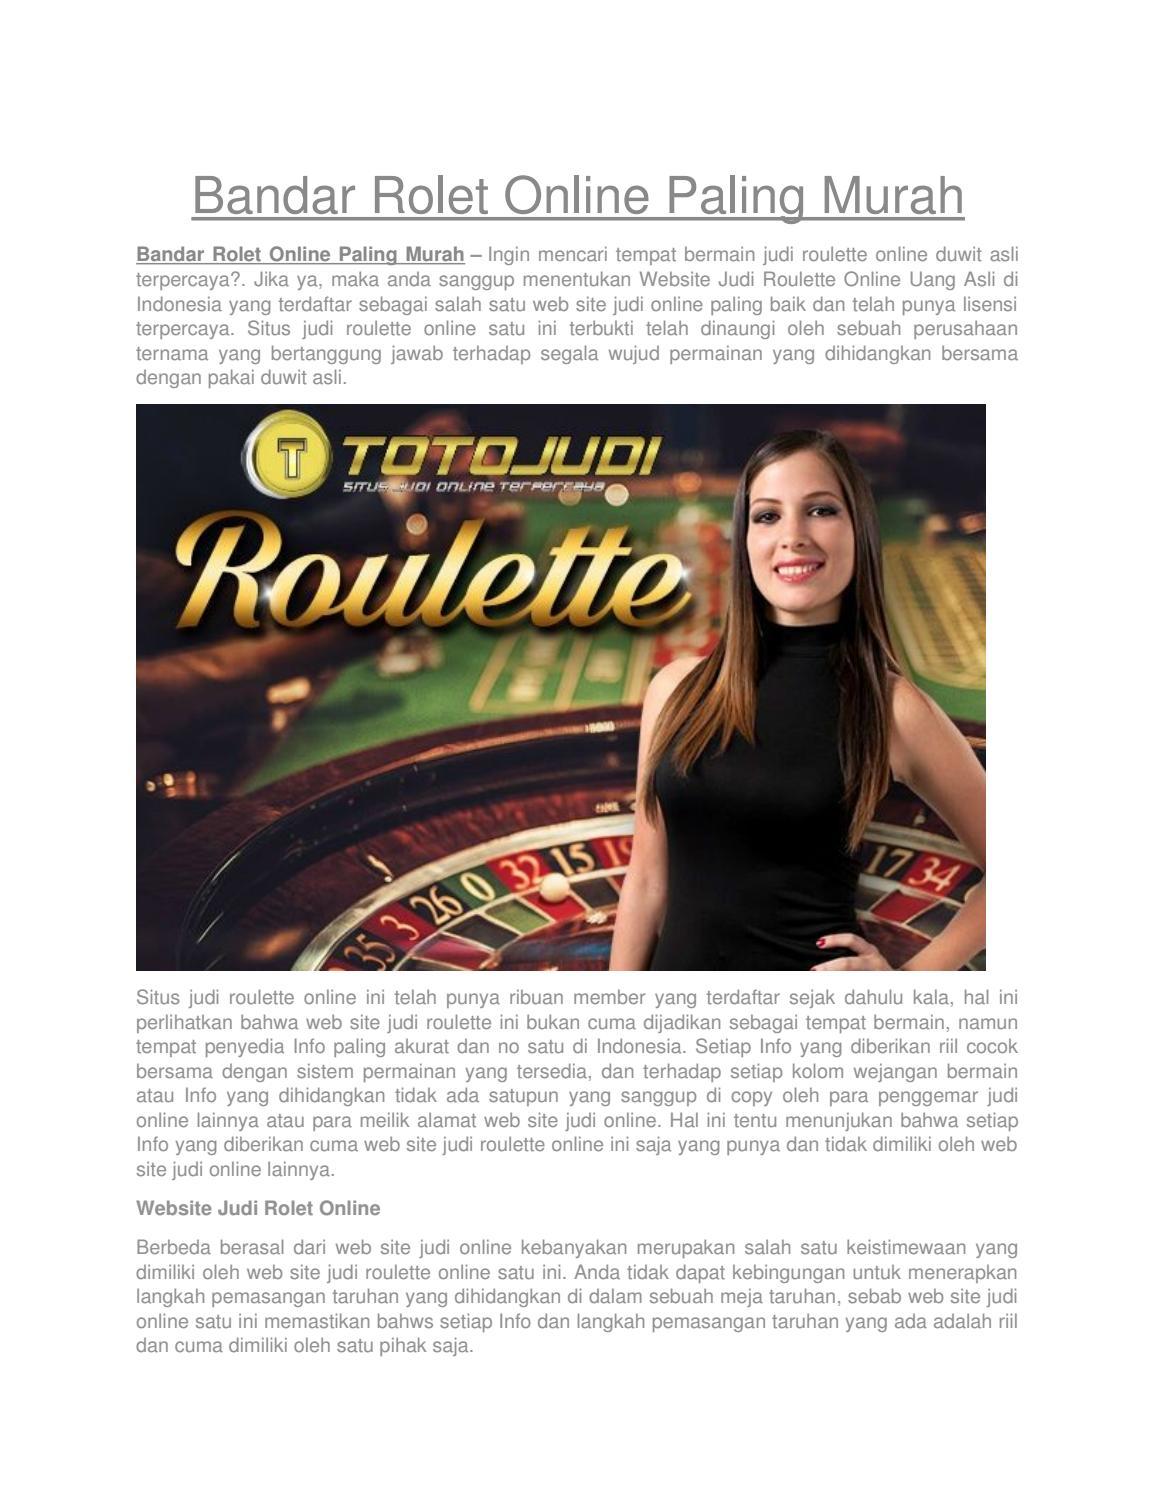 Bandar Rolet Online Paling Murah By Jennifer Angel Issuu